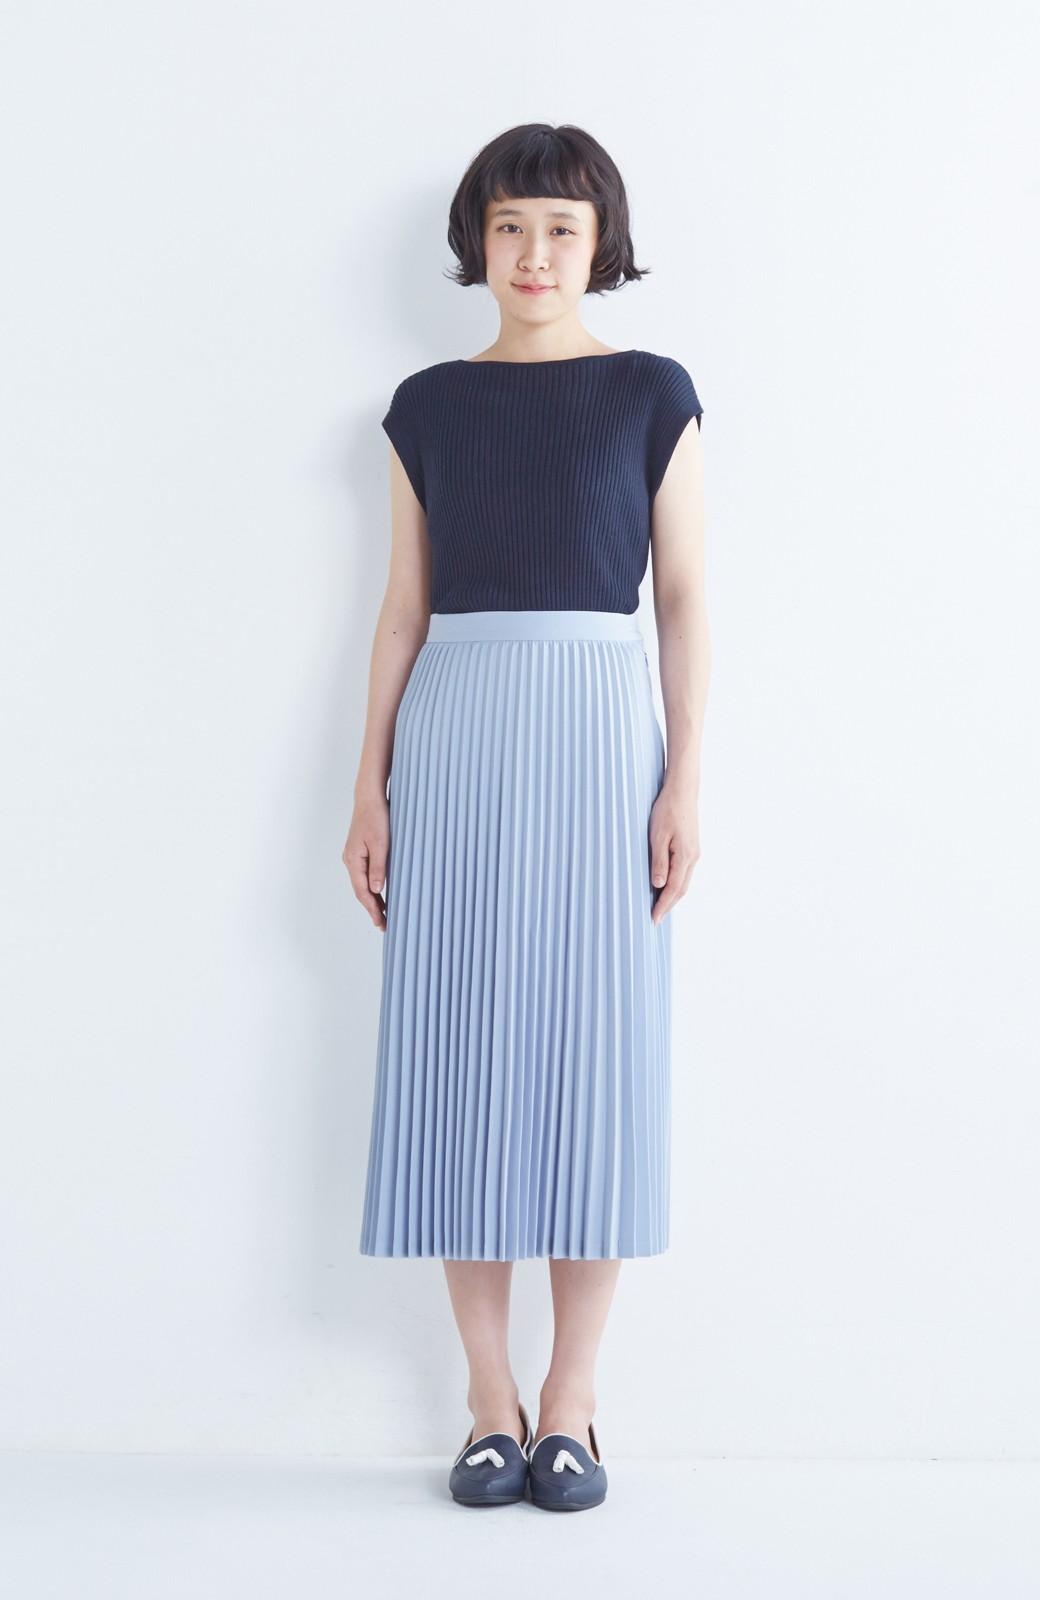 haco! 【mer11月号掲載】折り目正しい大人のためのプリーツスカート by que made me <サックスブルー>の商品写真3